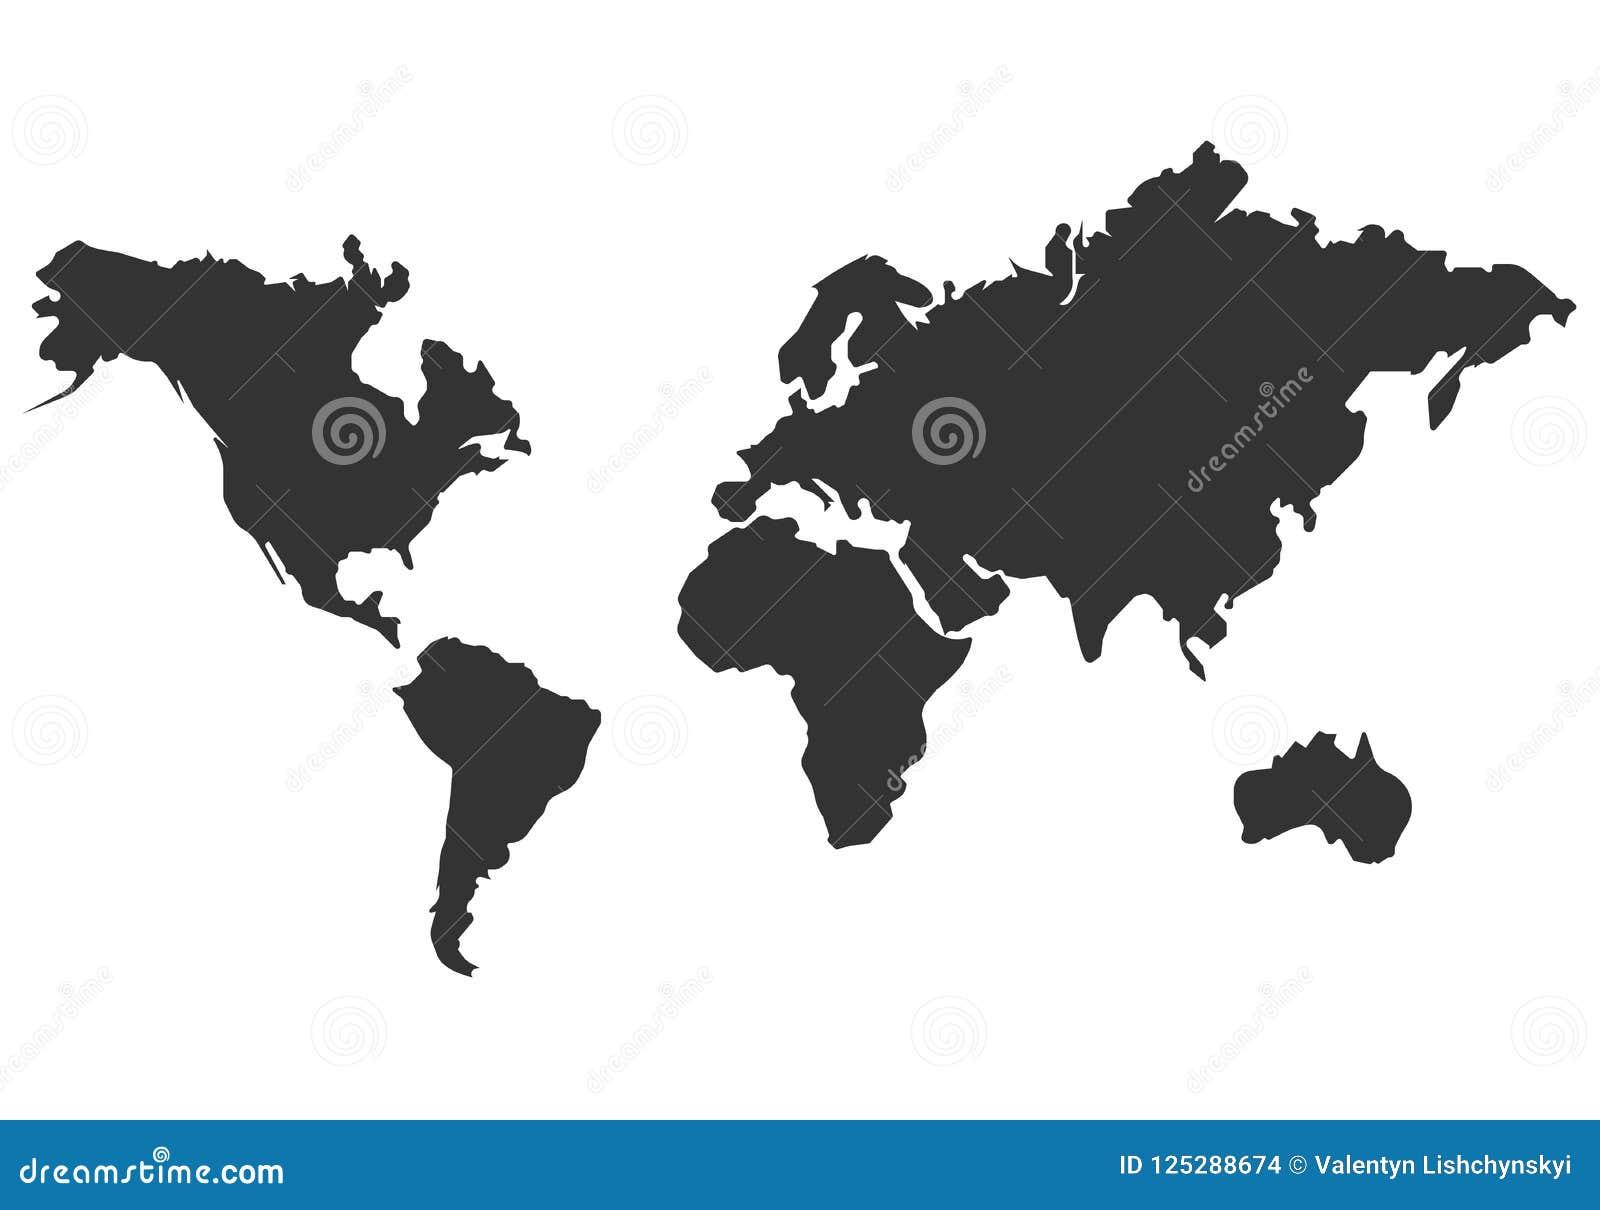 world map vector icon. simple Flat design